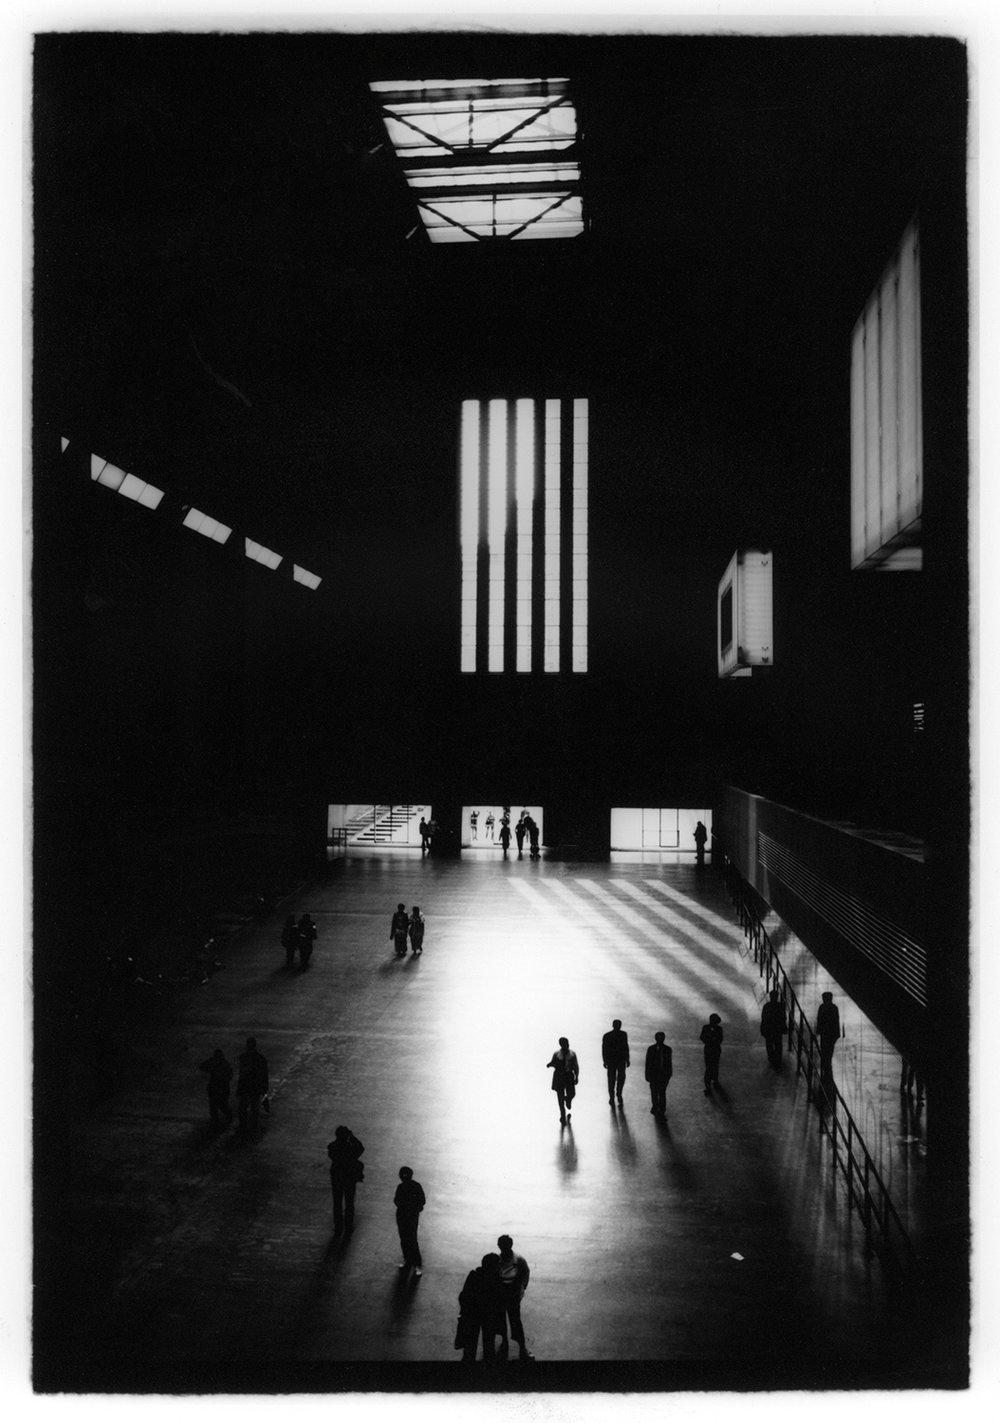 Turbine Hall, Tate Modern, London, 2000